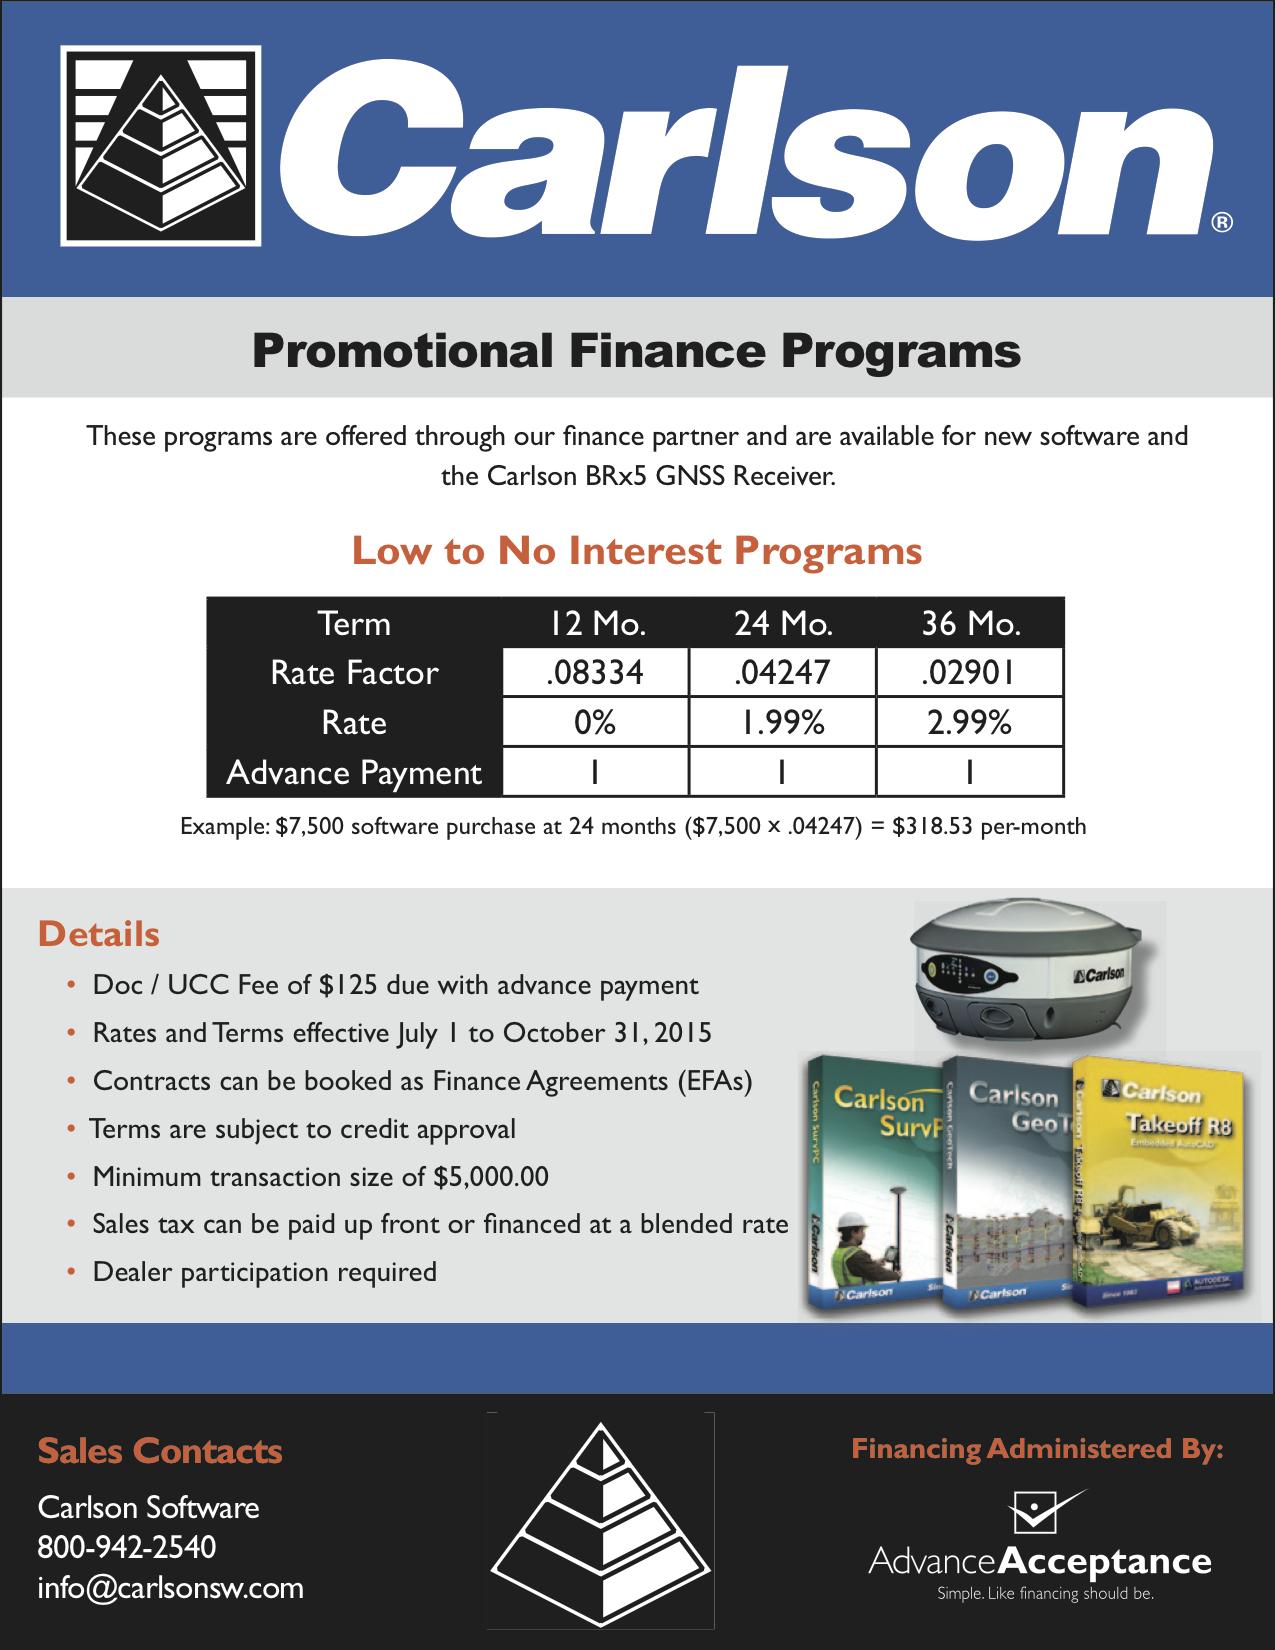 Carlson Software Promo Programs, Q3 2015 -- Advance Acceptance